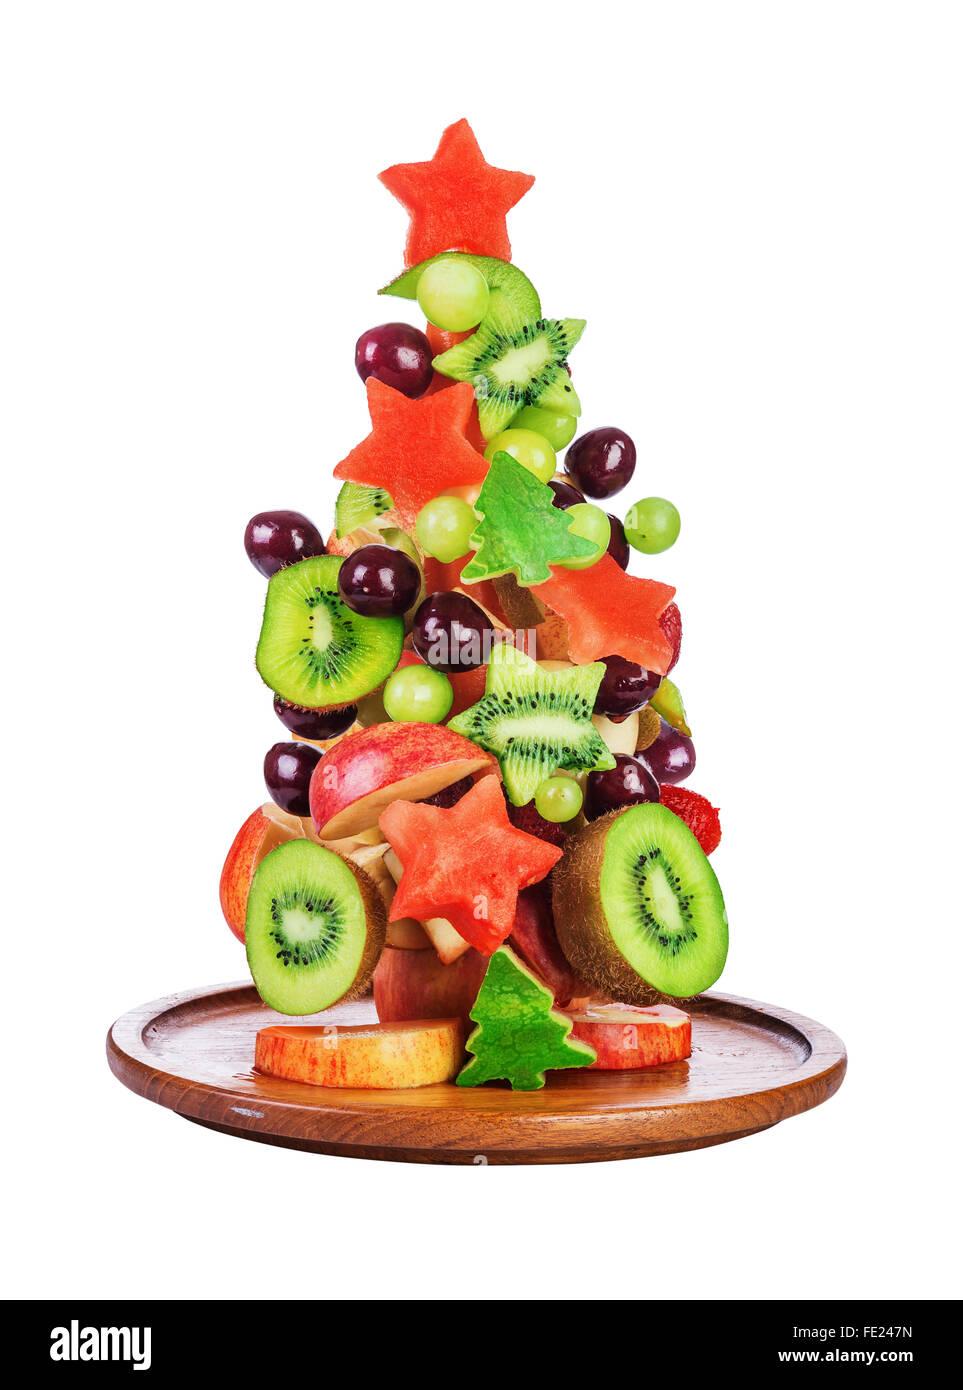 Fruit Salad Tree Stock Photos Fruit Salad Tree Stock Images Alamy